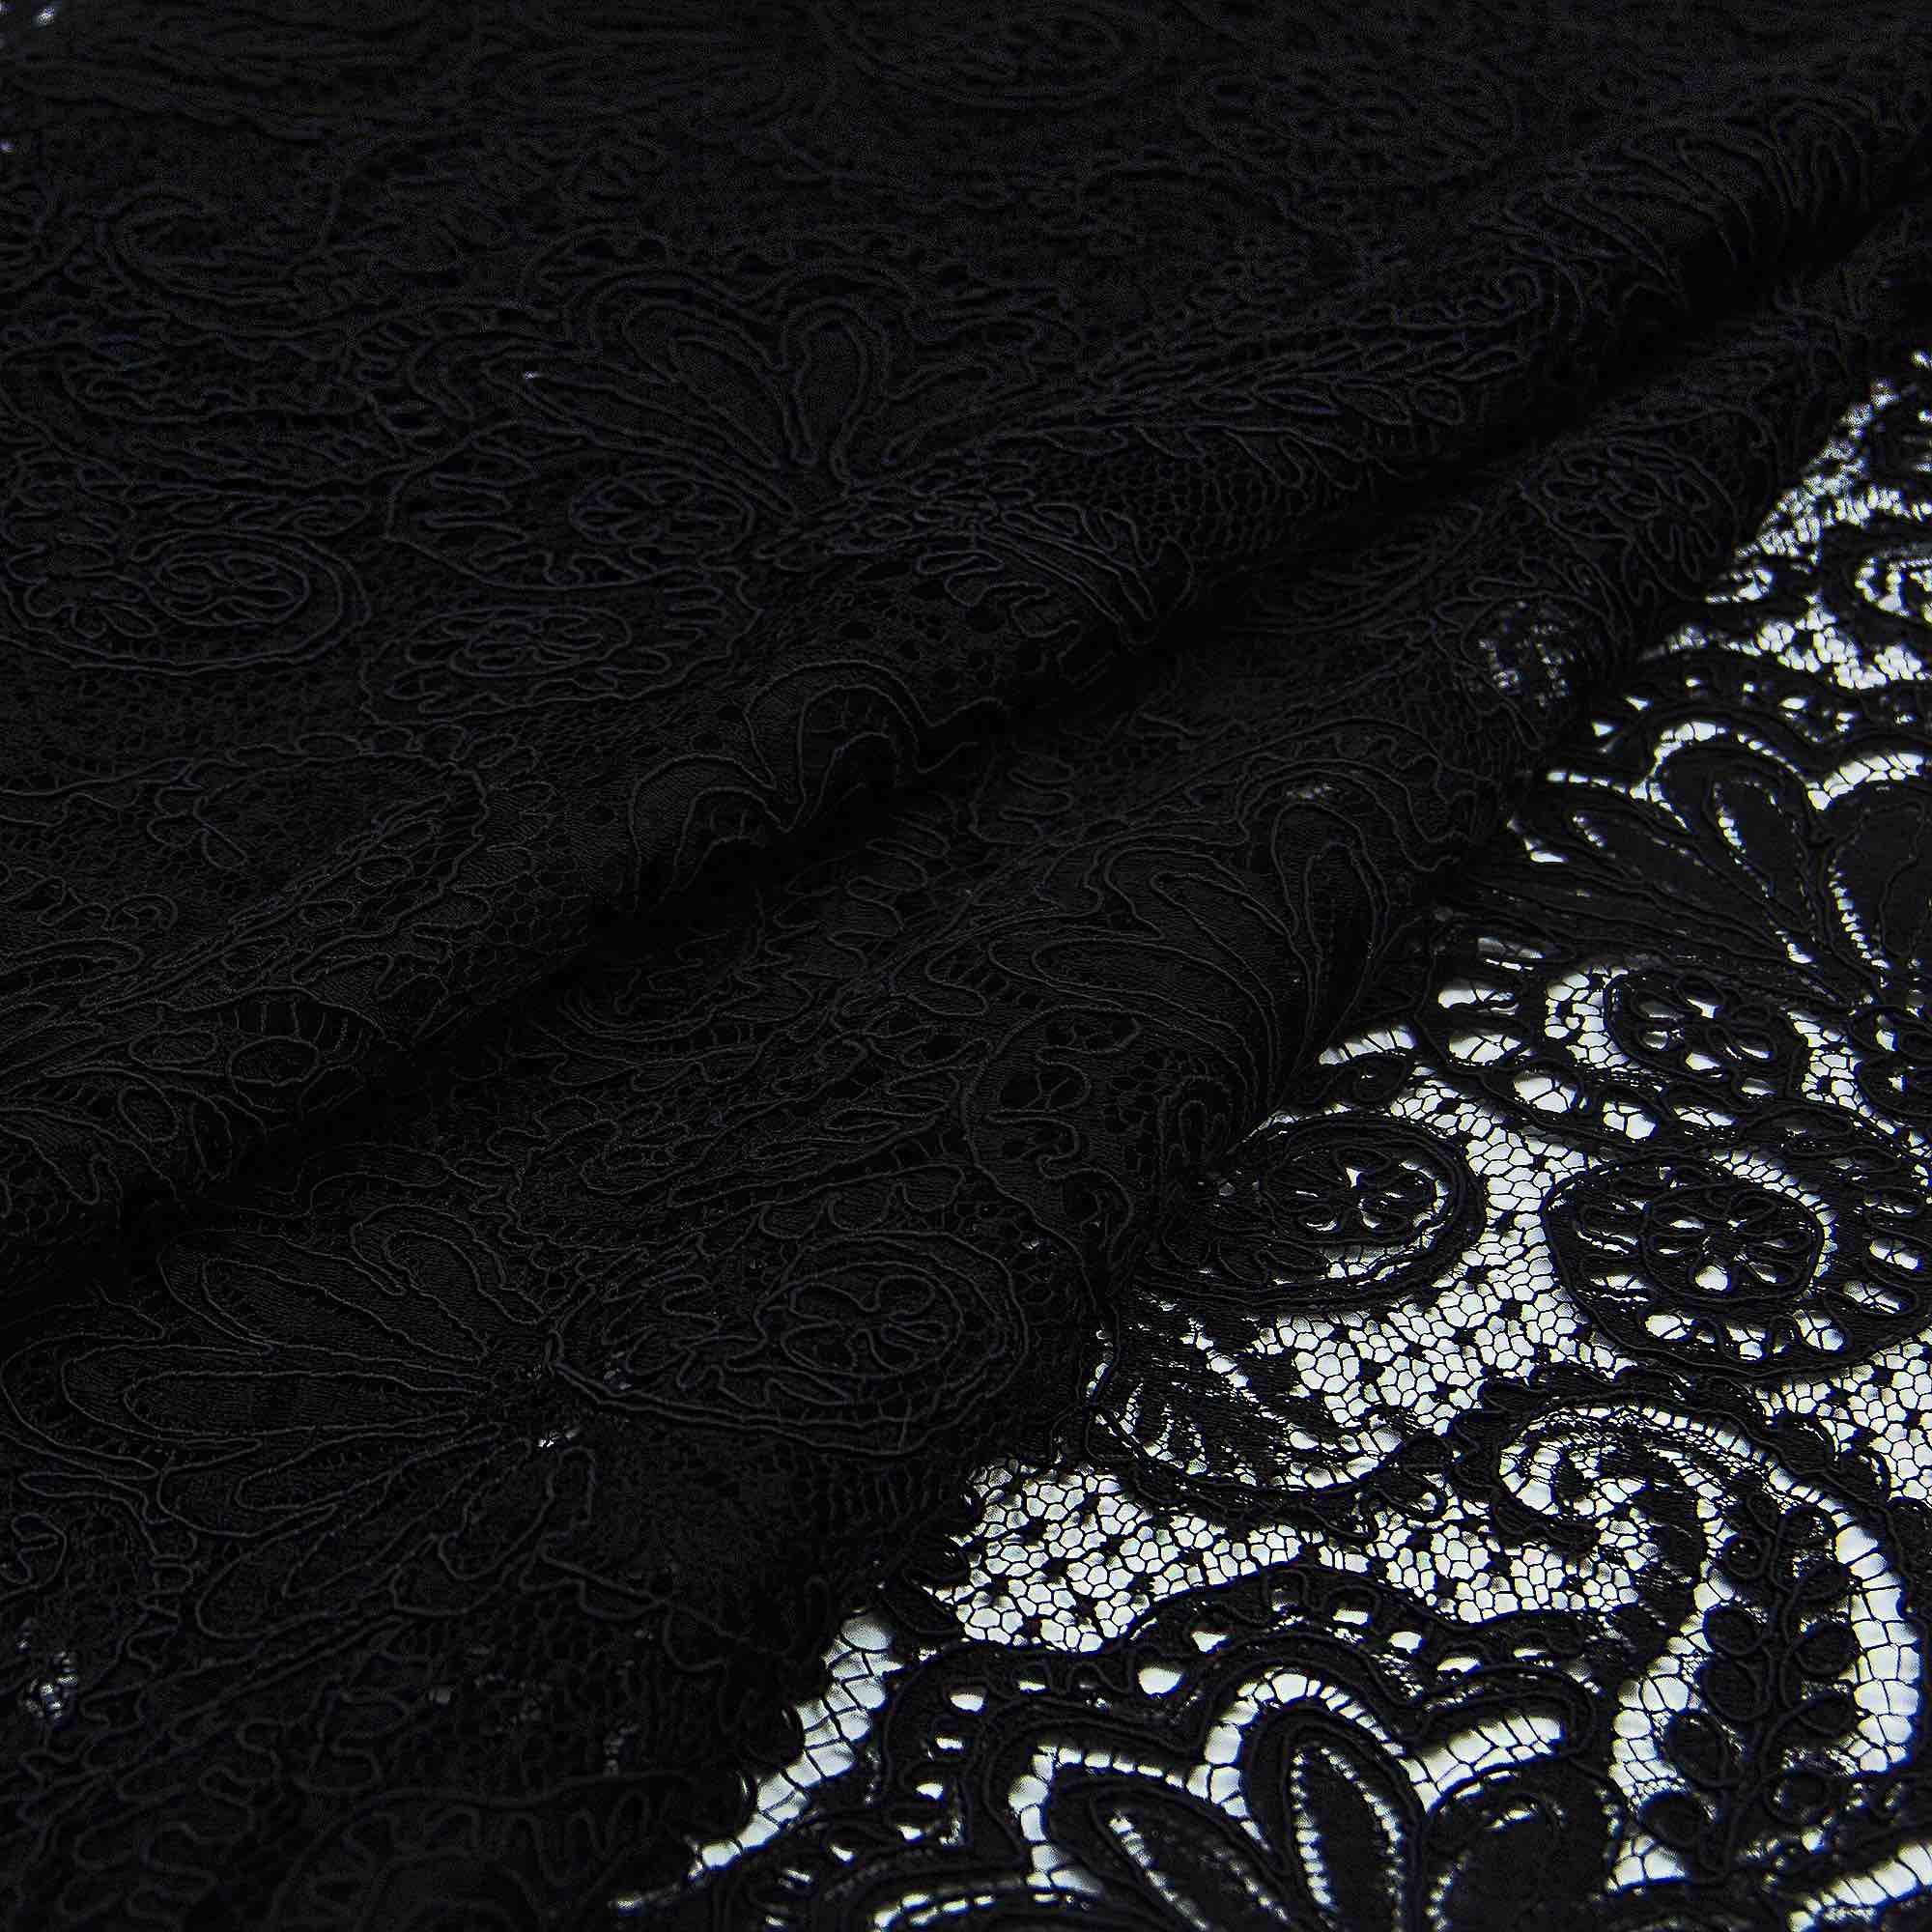 d93d1d57e10 Плотное черное кружево